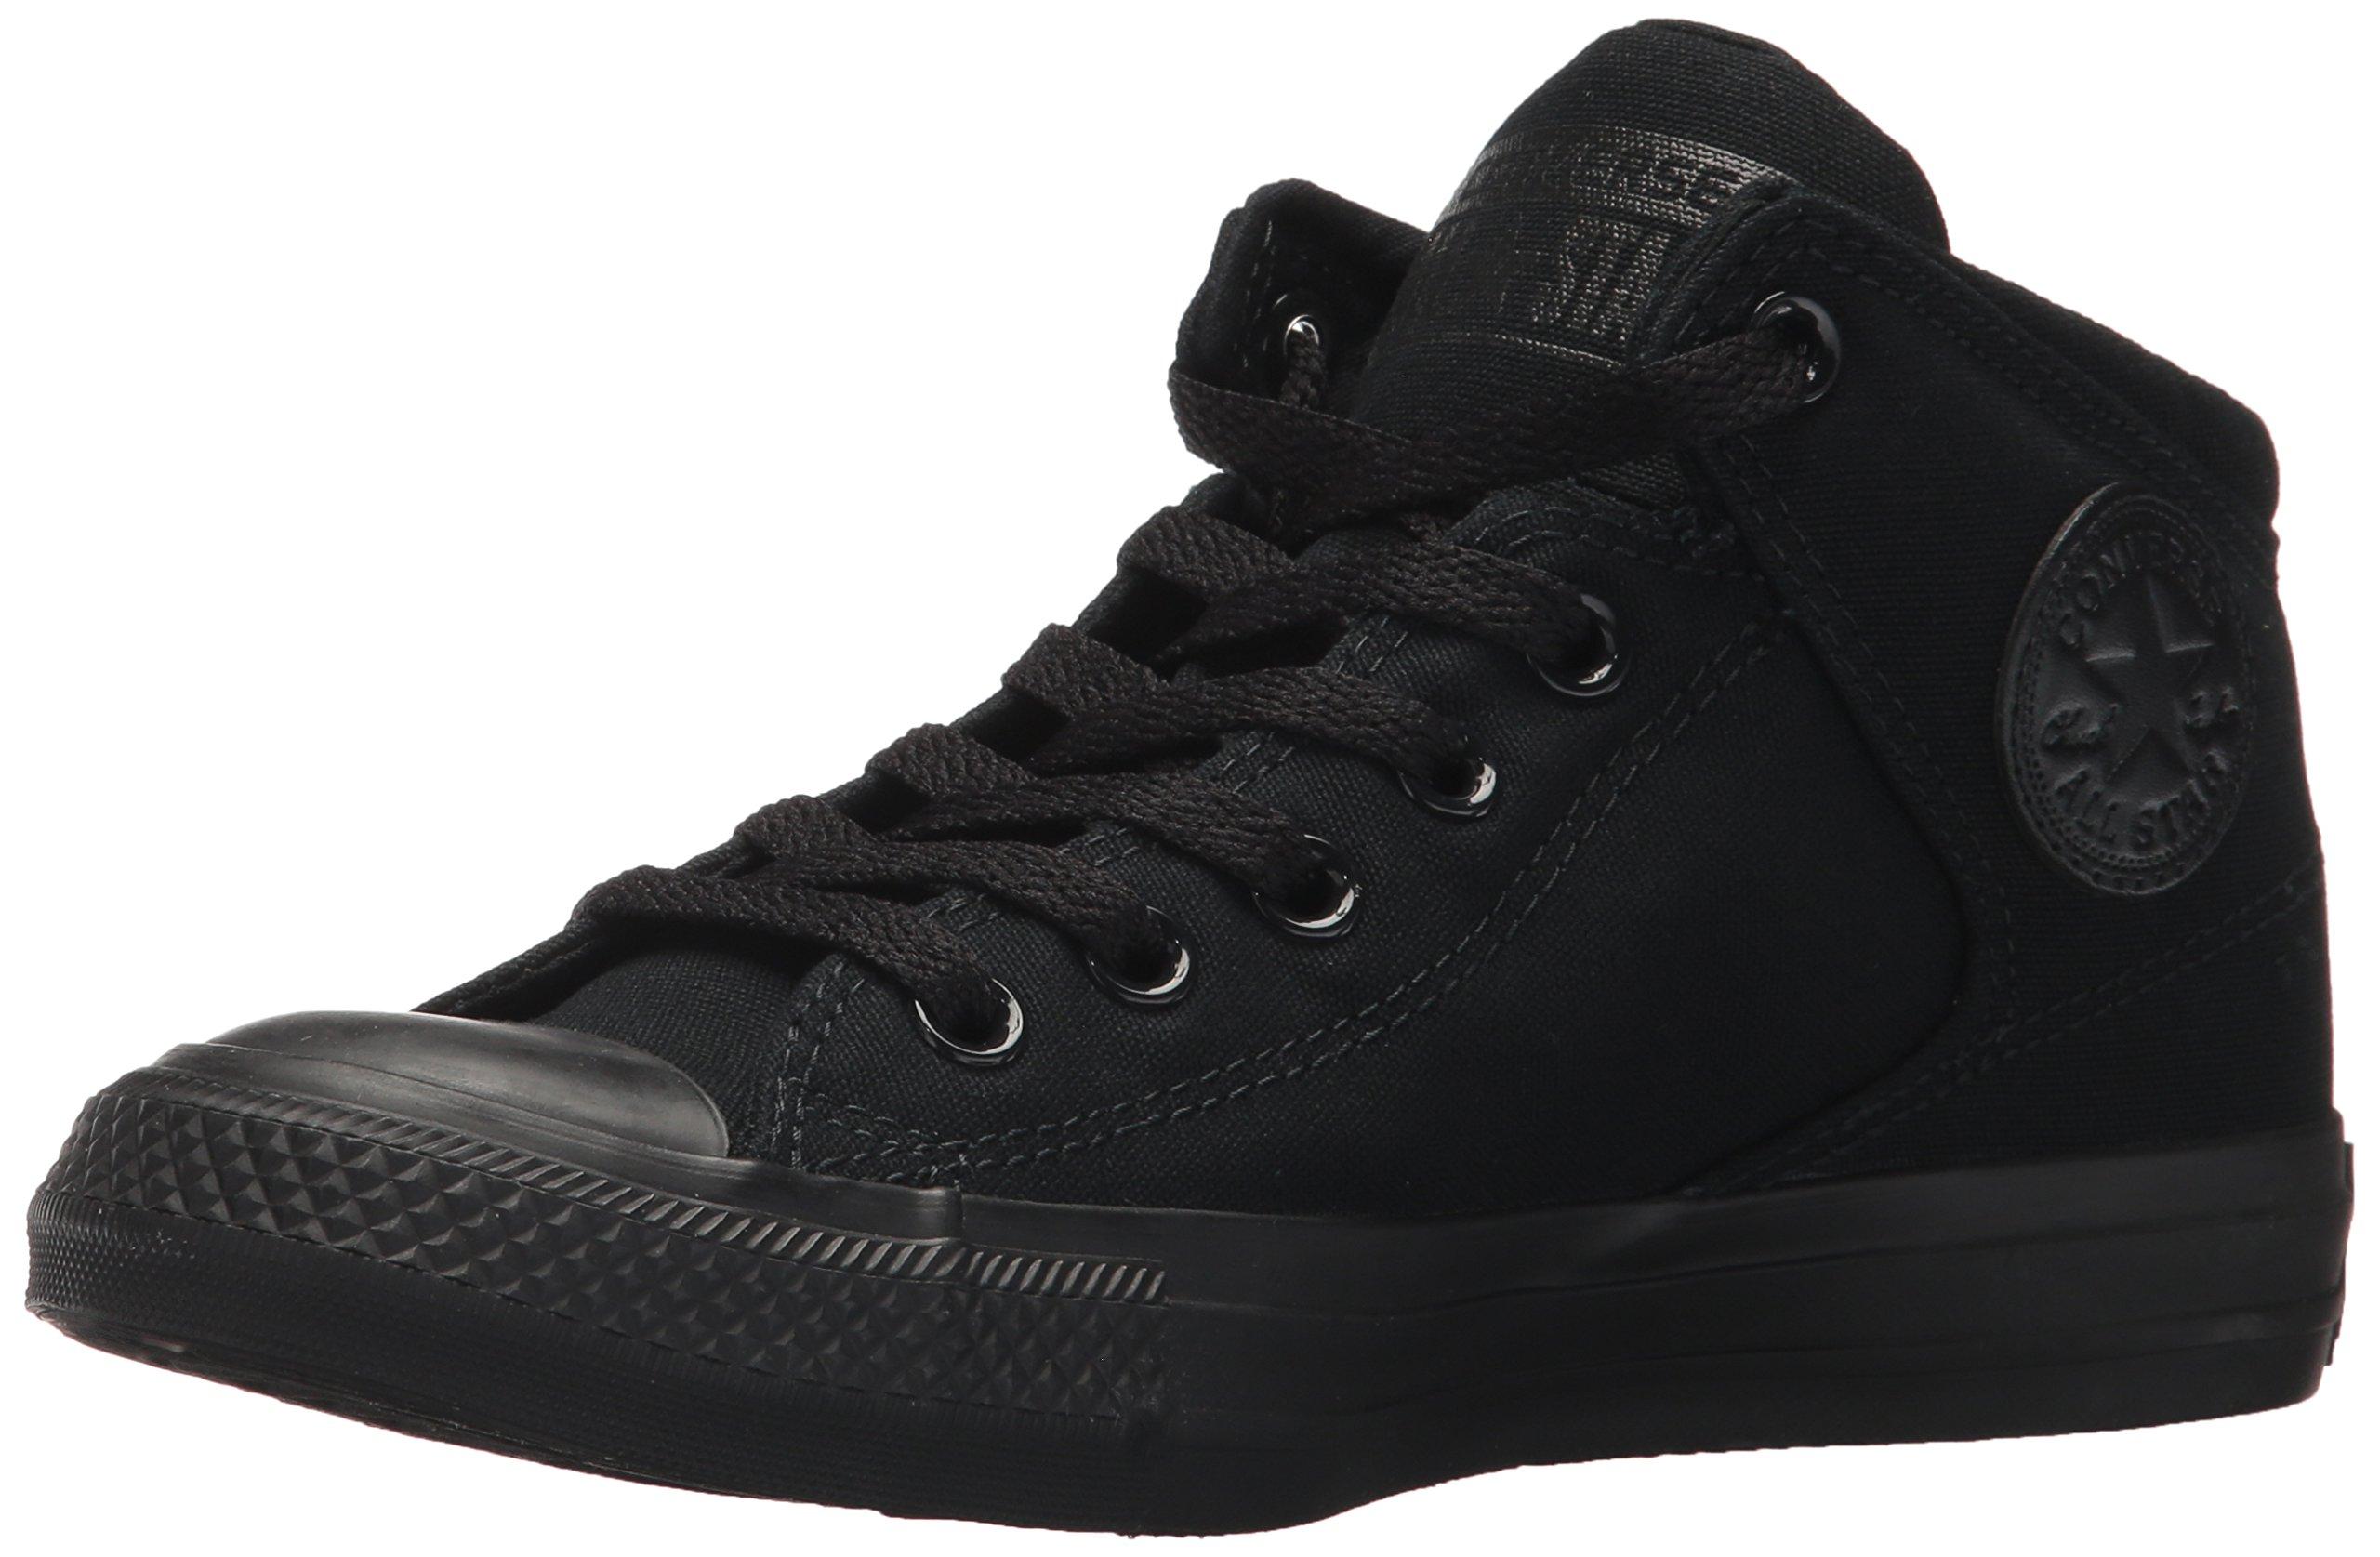 aeb1d672da2f Galleon - Converse Men s Street Tonal Canvas High Top Shoe